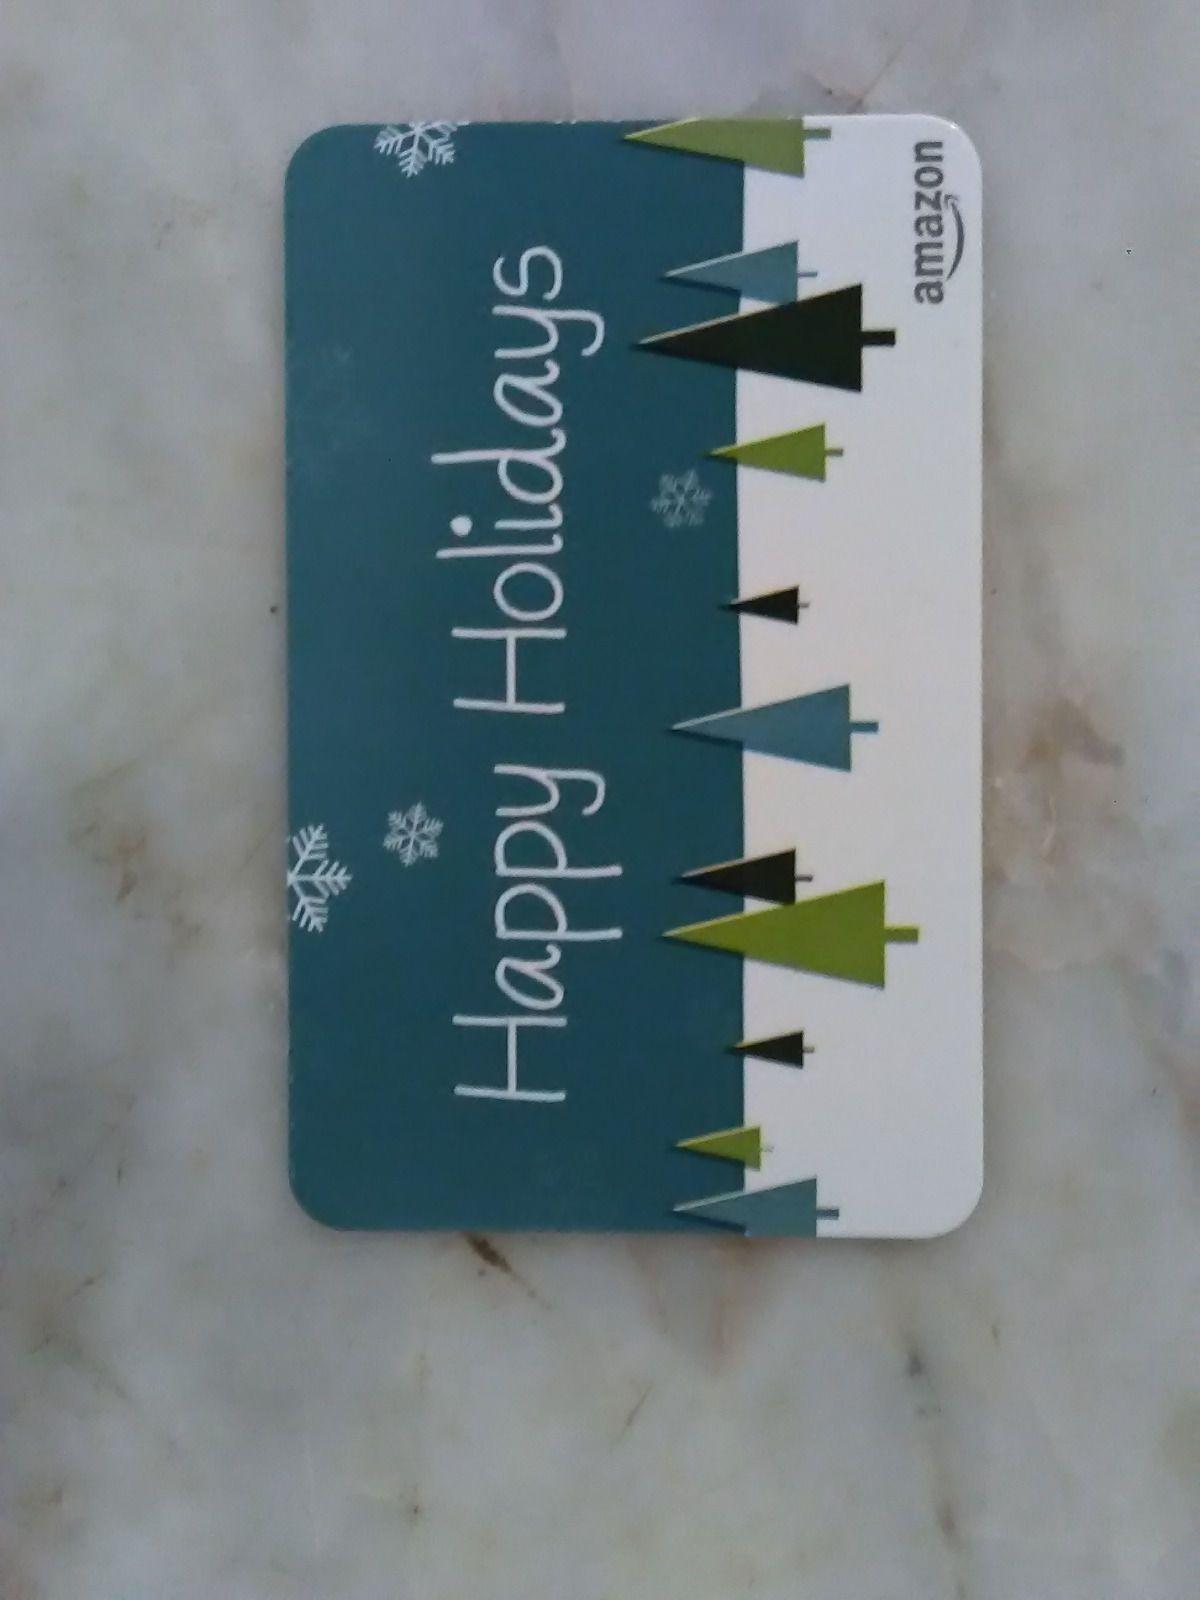 how to use vanilla gift card on amazon uk